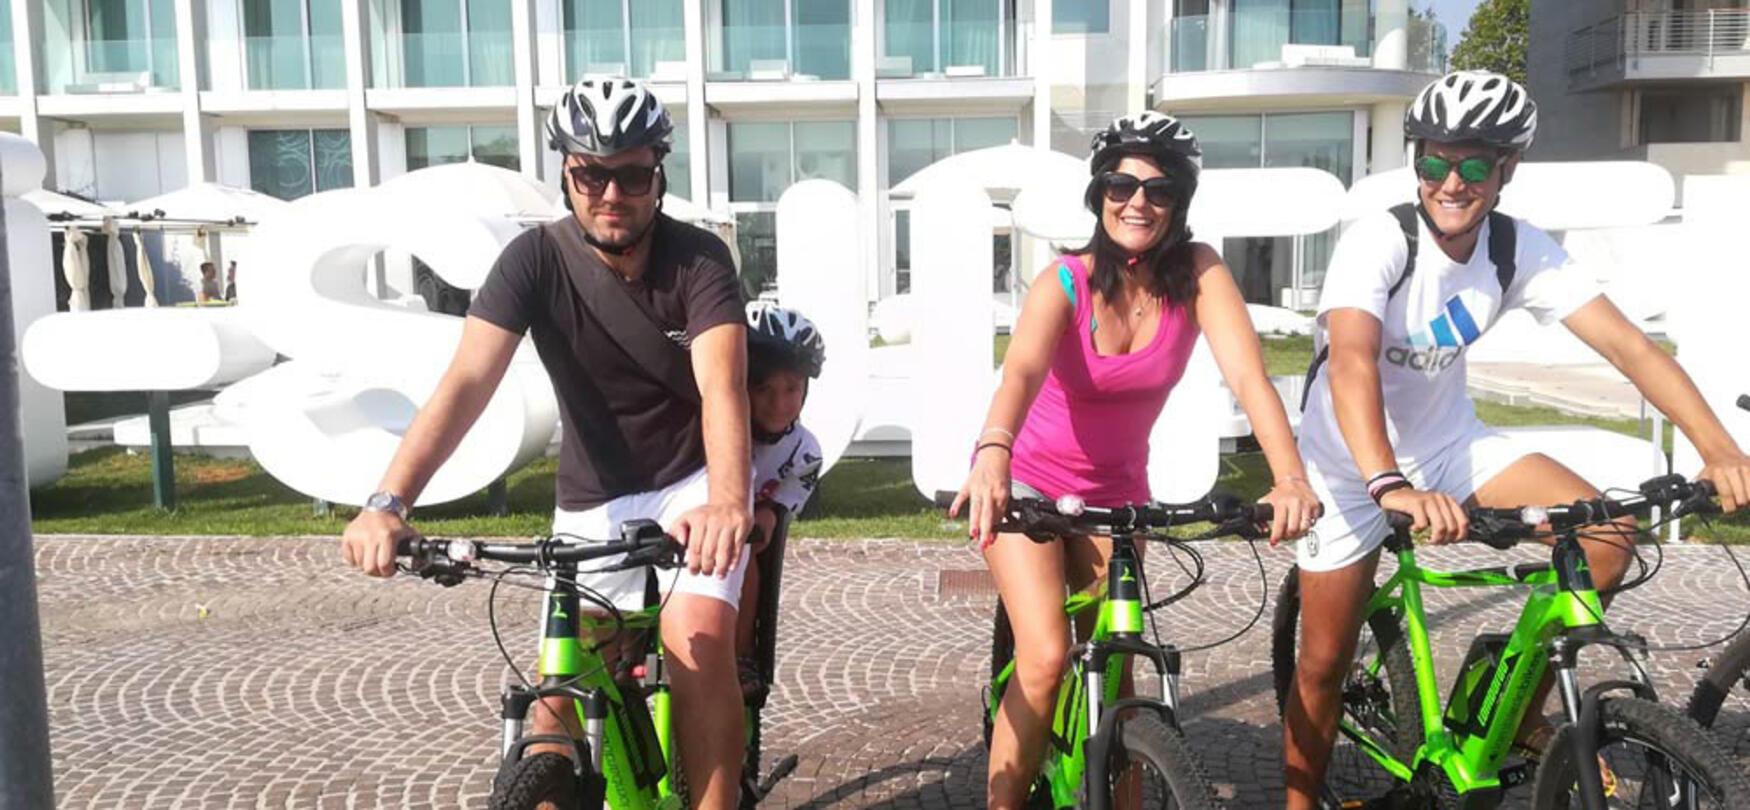 ambienthotels en electric-vehicle-rental-rimini 007